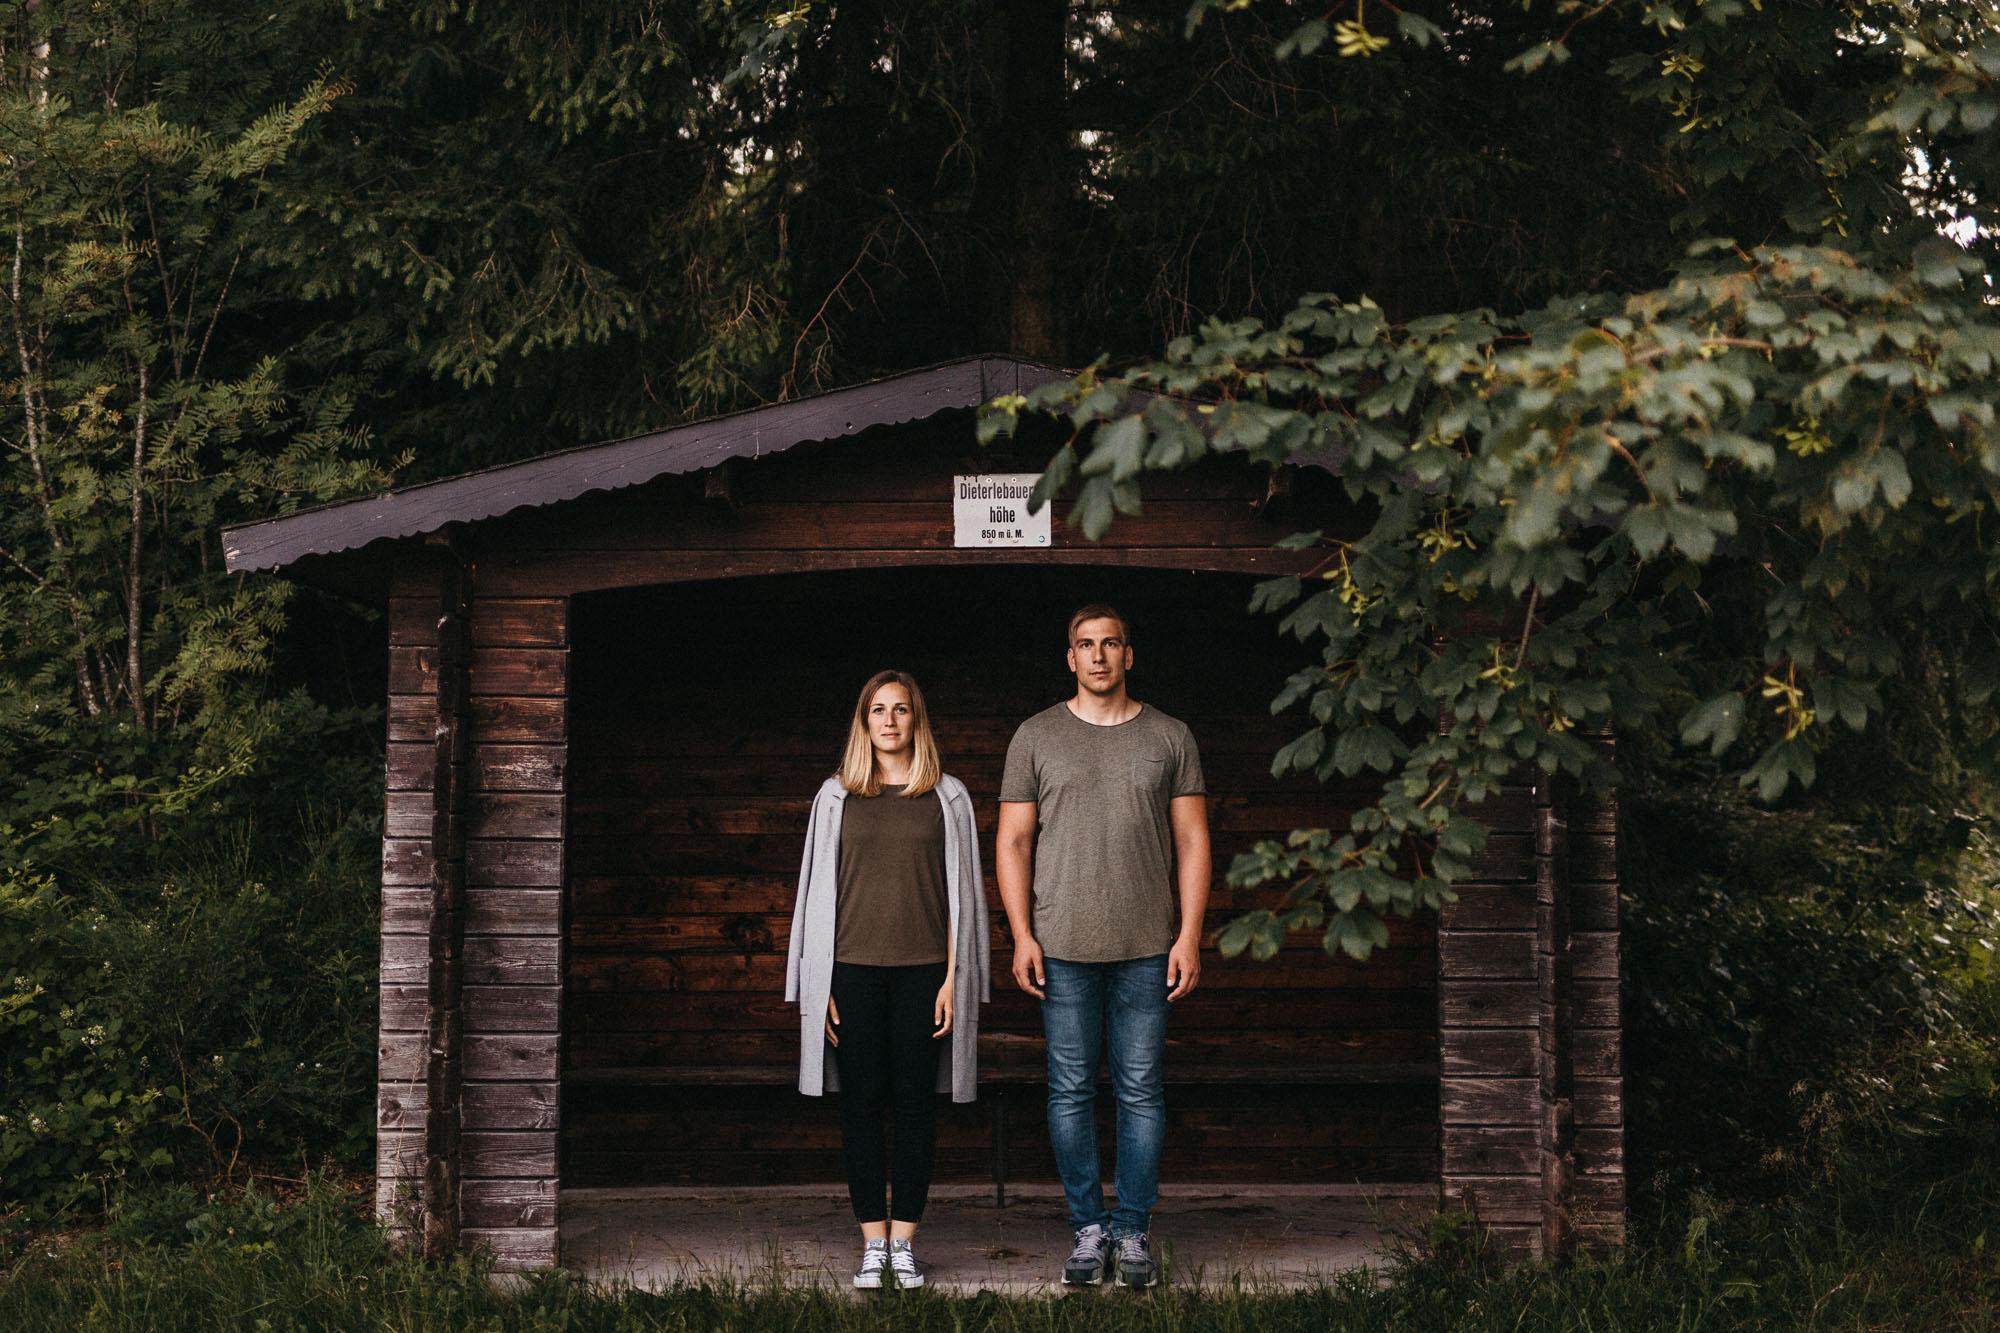 raissa simon photography hannah sven paar schwarzwald hornberg 12 1 - Hannah + Sven